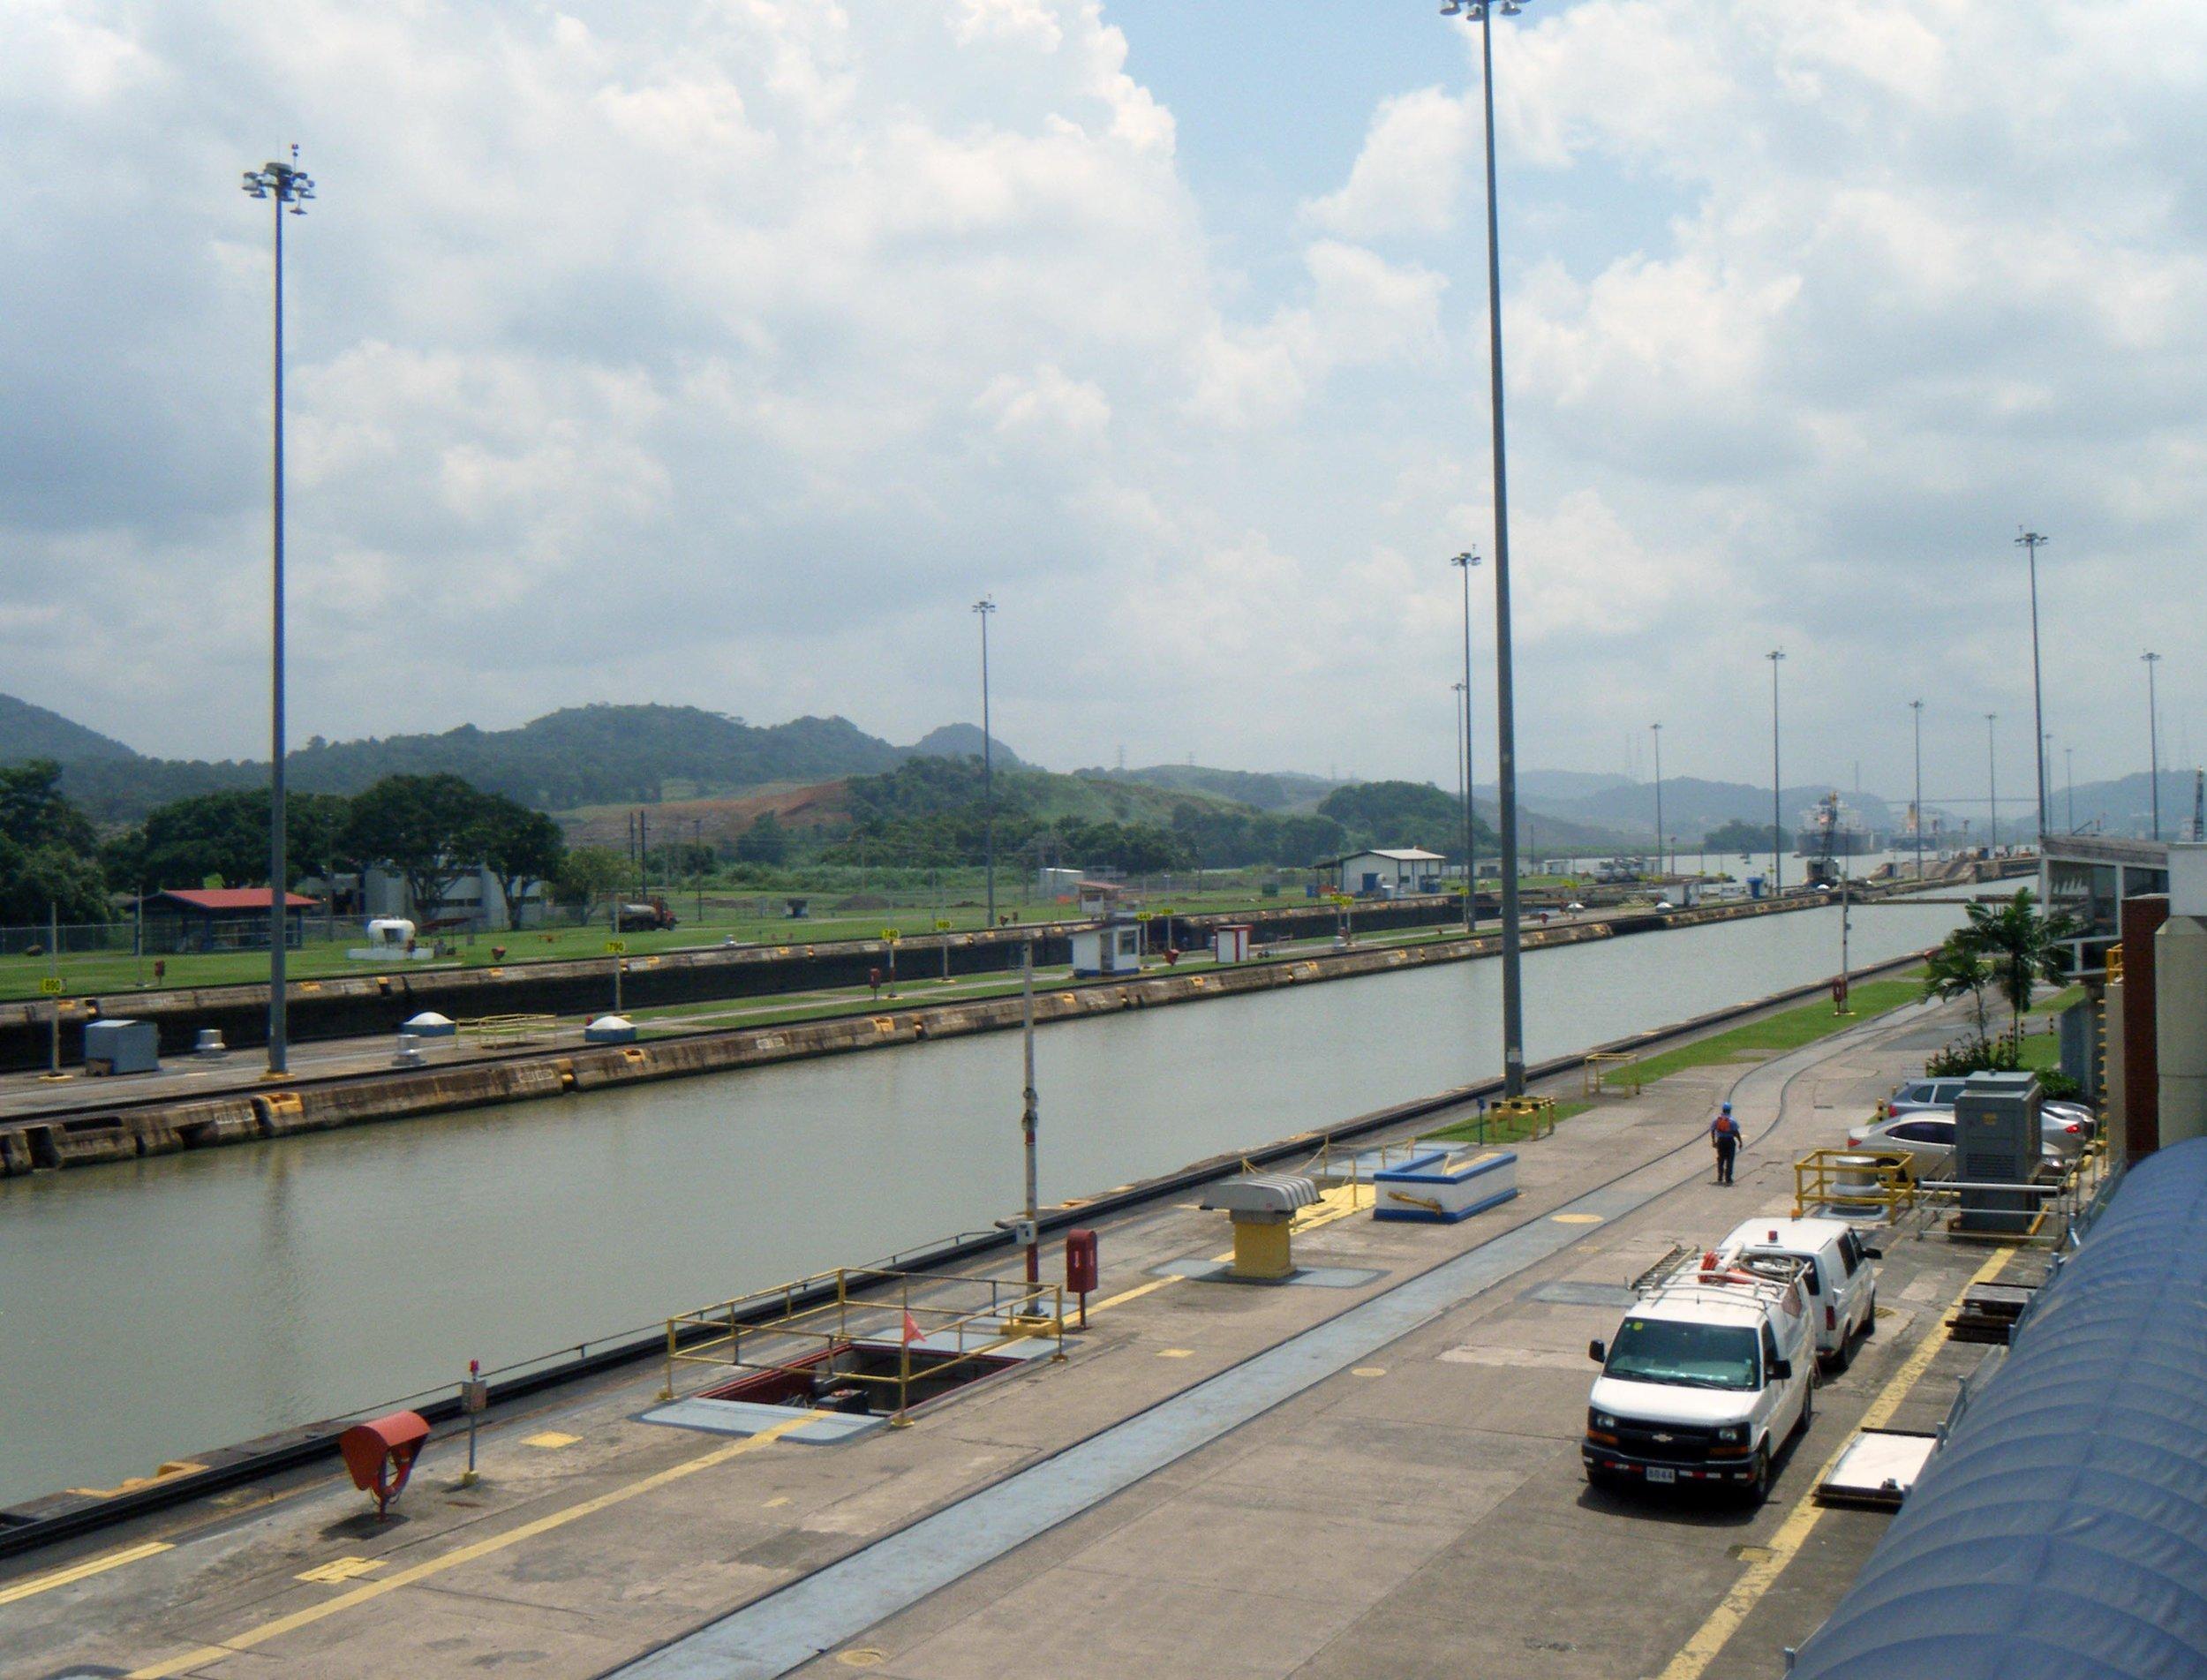 Panama canal 7-12-12.jpg